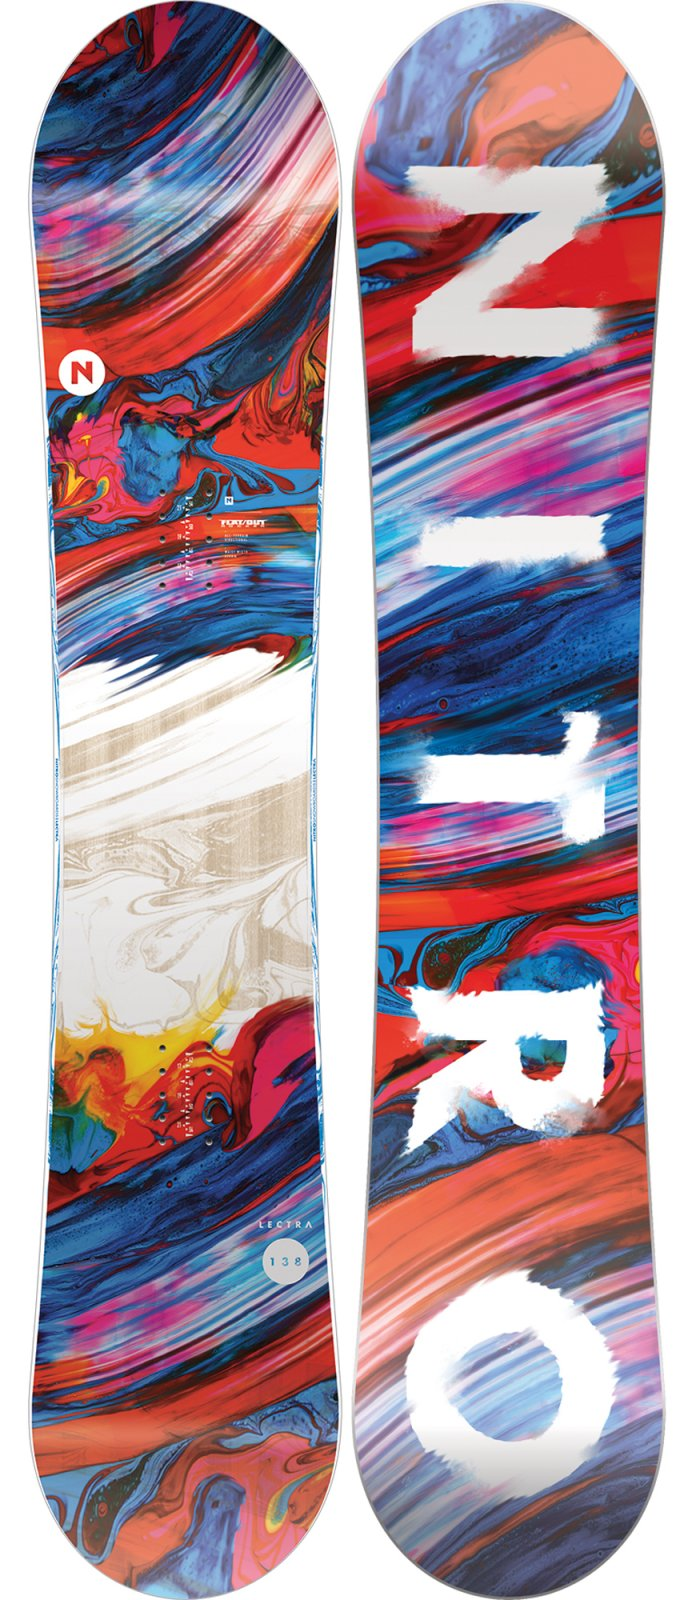 Nitro Lectra Snowboard 2020